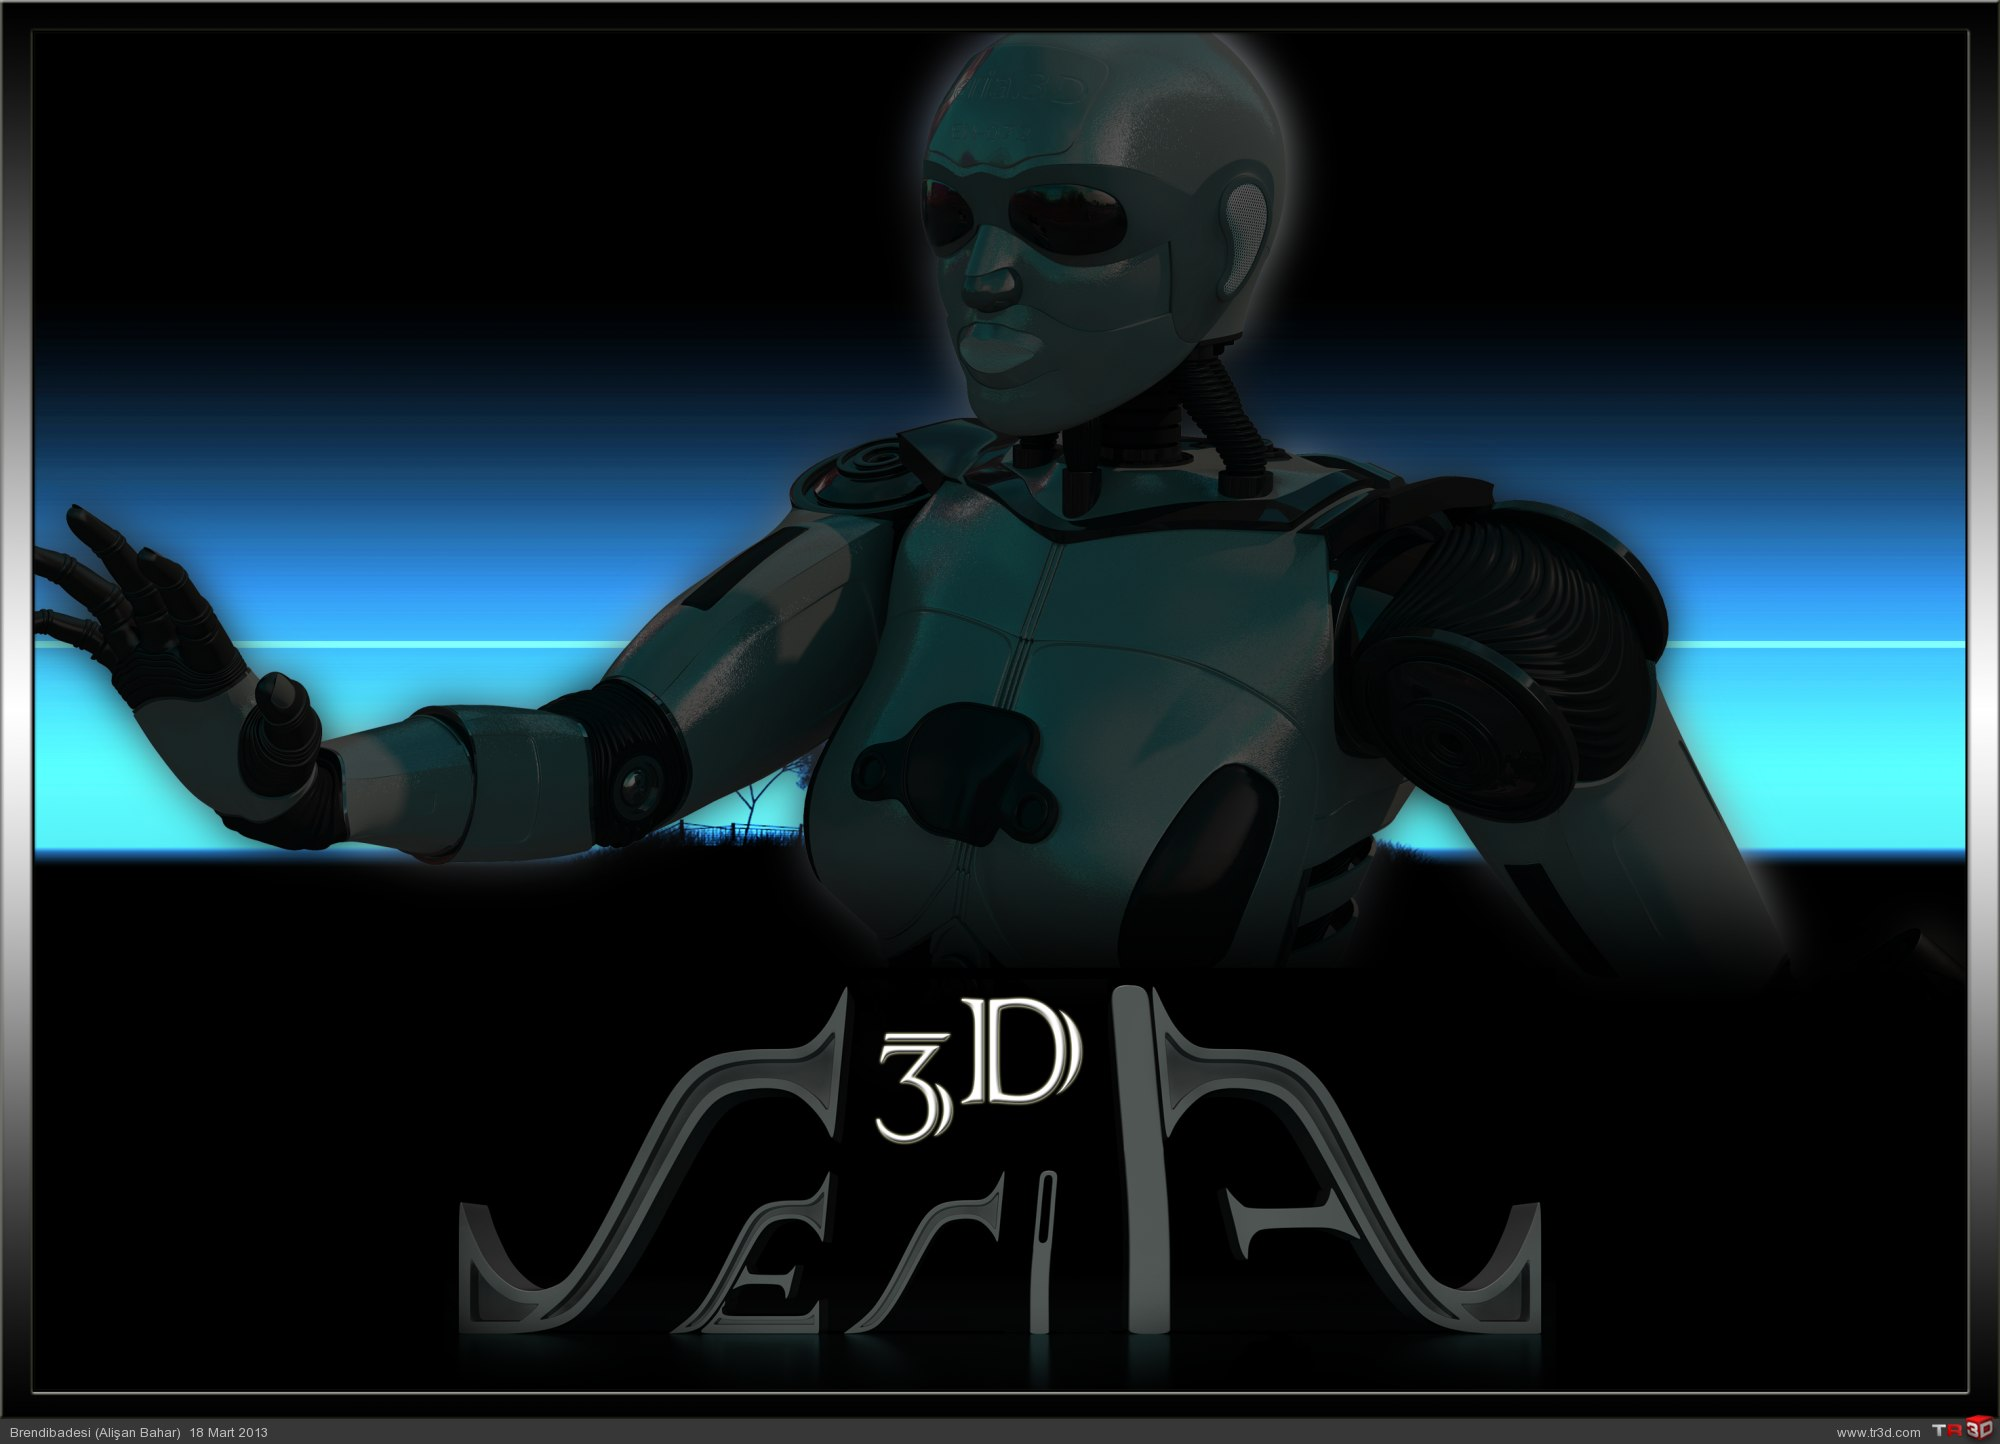 Seria3D - Blender Düşen Düğmeler